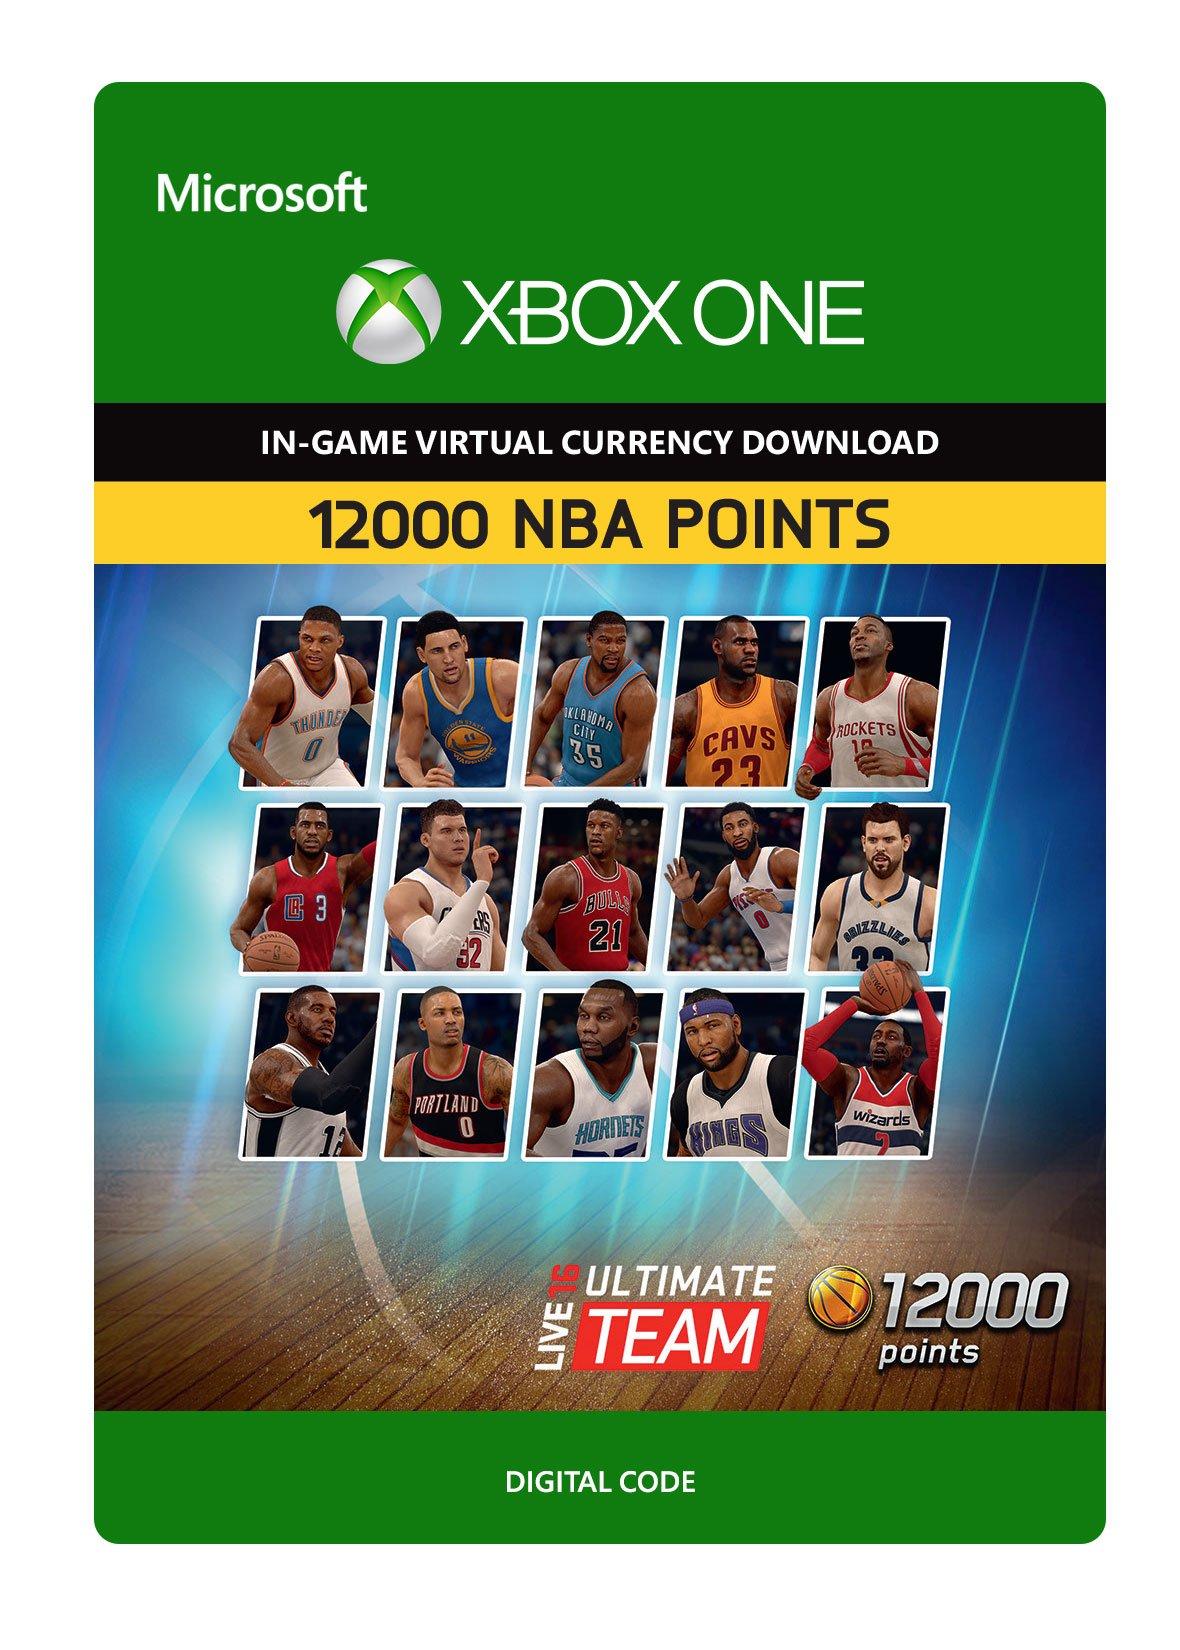 NBA Live 16 LUT 12,000 NBA Points Pack - Xbox One Digital Code